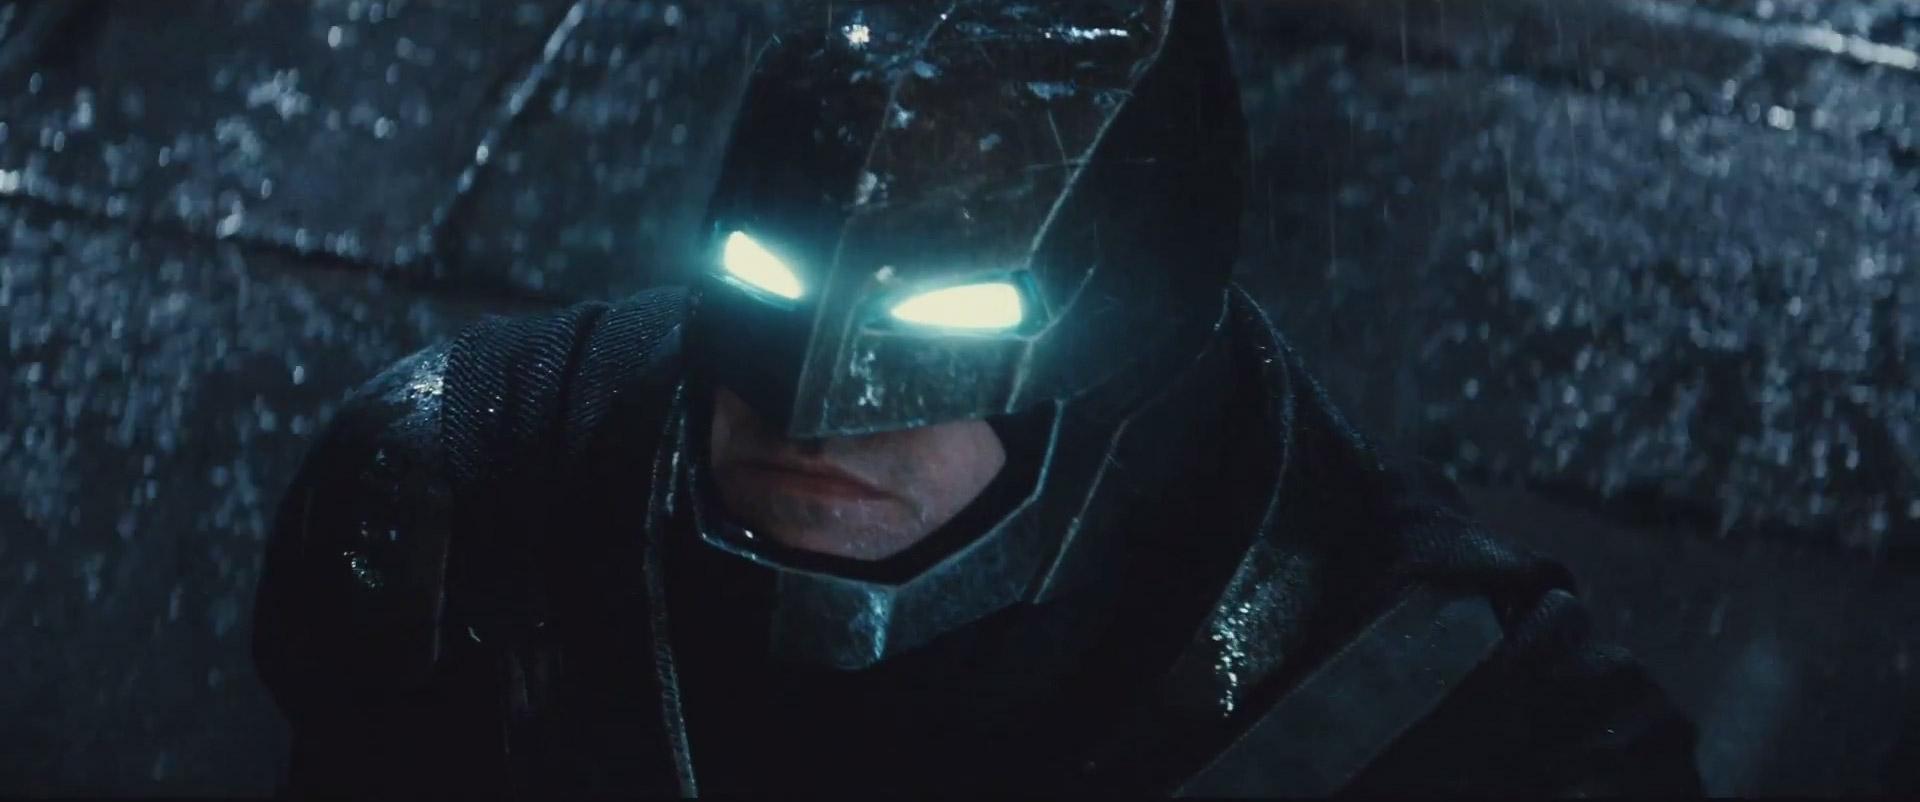 batman v superman dawn of justice trailer sdcc 2015